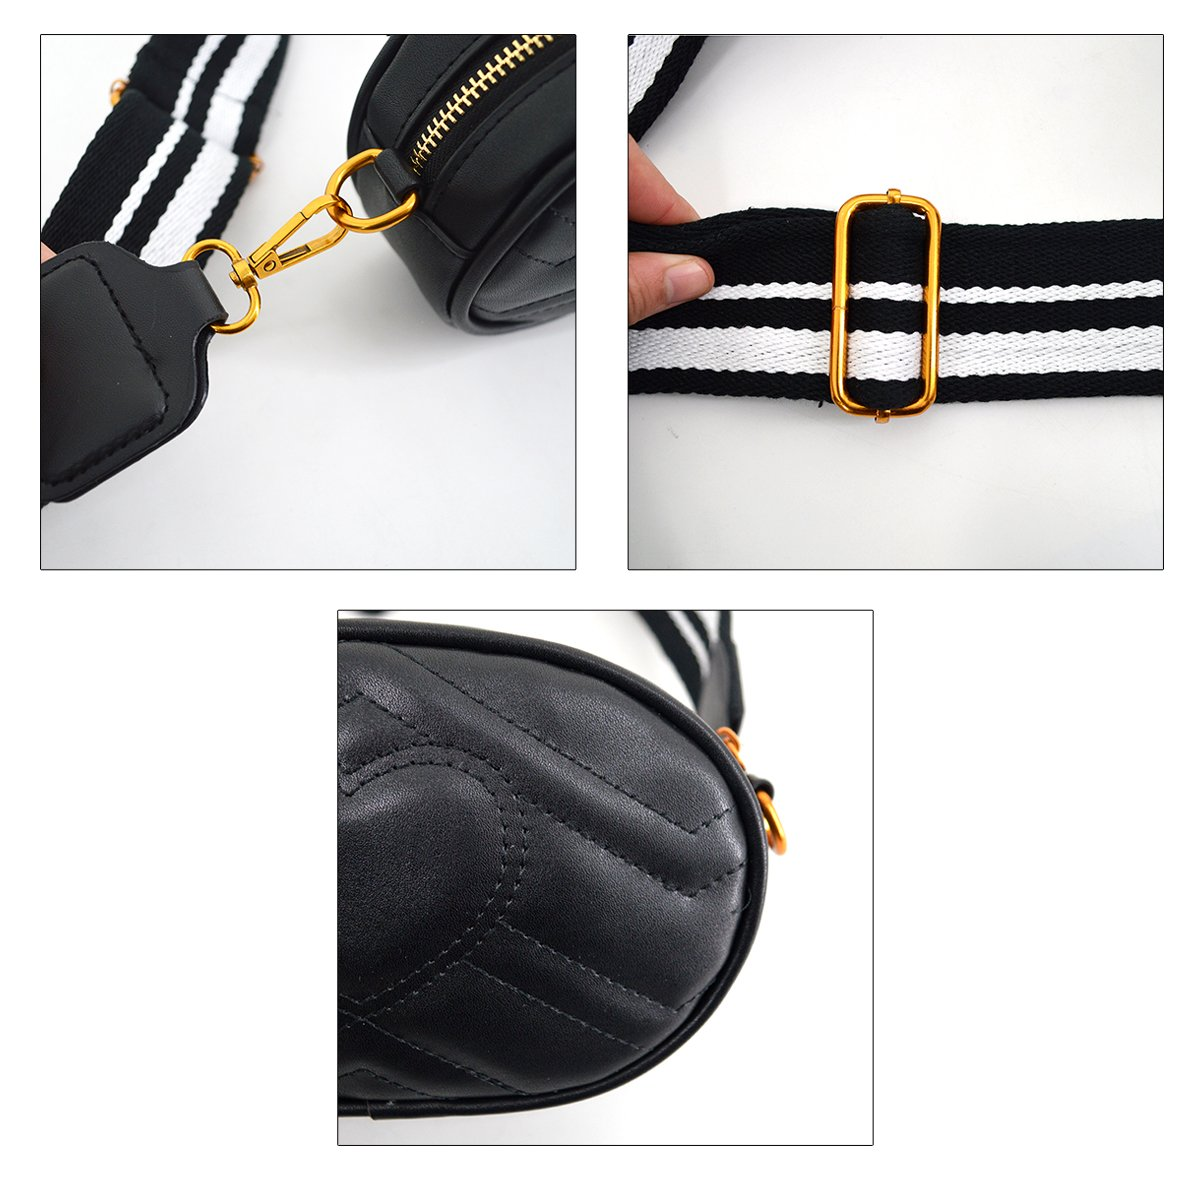 Mily Fashion Women Elegant PU Leather Waist Bag Love Shape Pattern Embroidery Cross Body Bag Fanny Packs by Mily (Image #9)